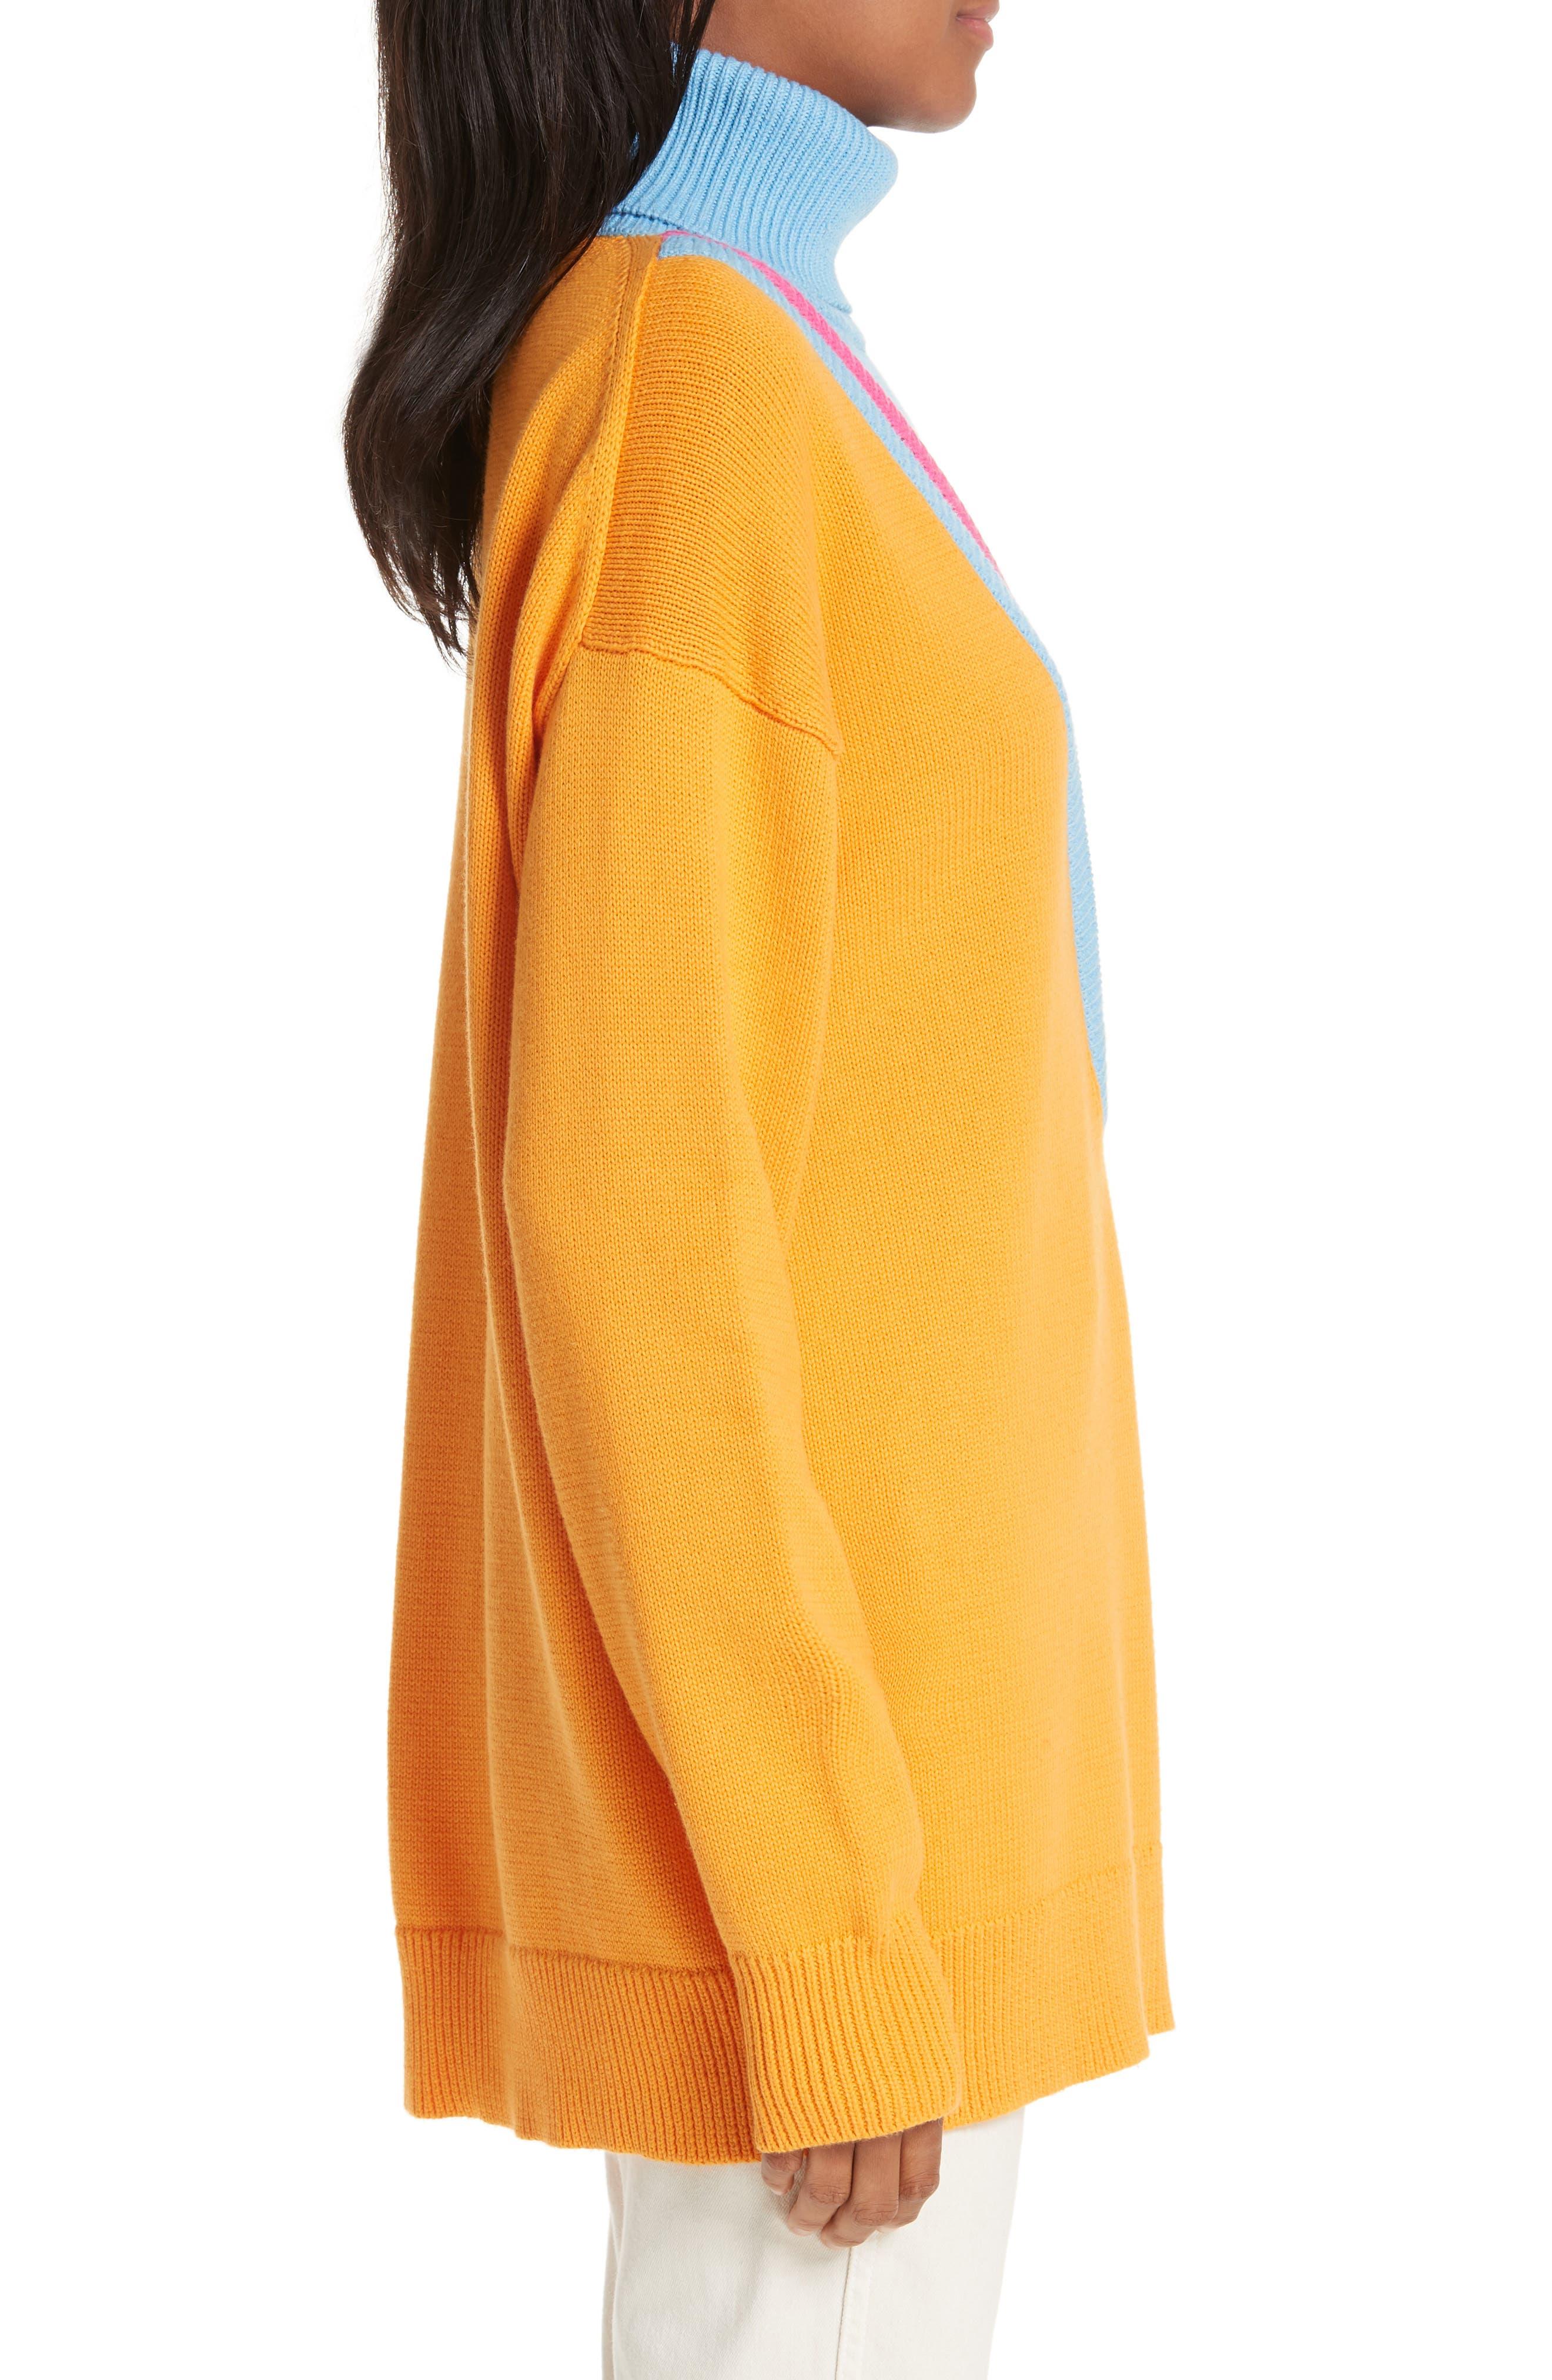 VICTOR GLEMAUD,                             Layered Cotton & Cashmere Turtleneck Sweater,                             Alternate thumbnail 3, color,                             ORANGE COMBO